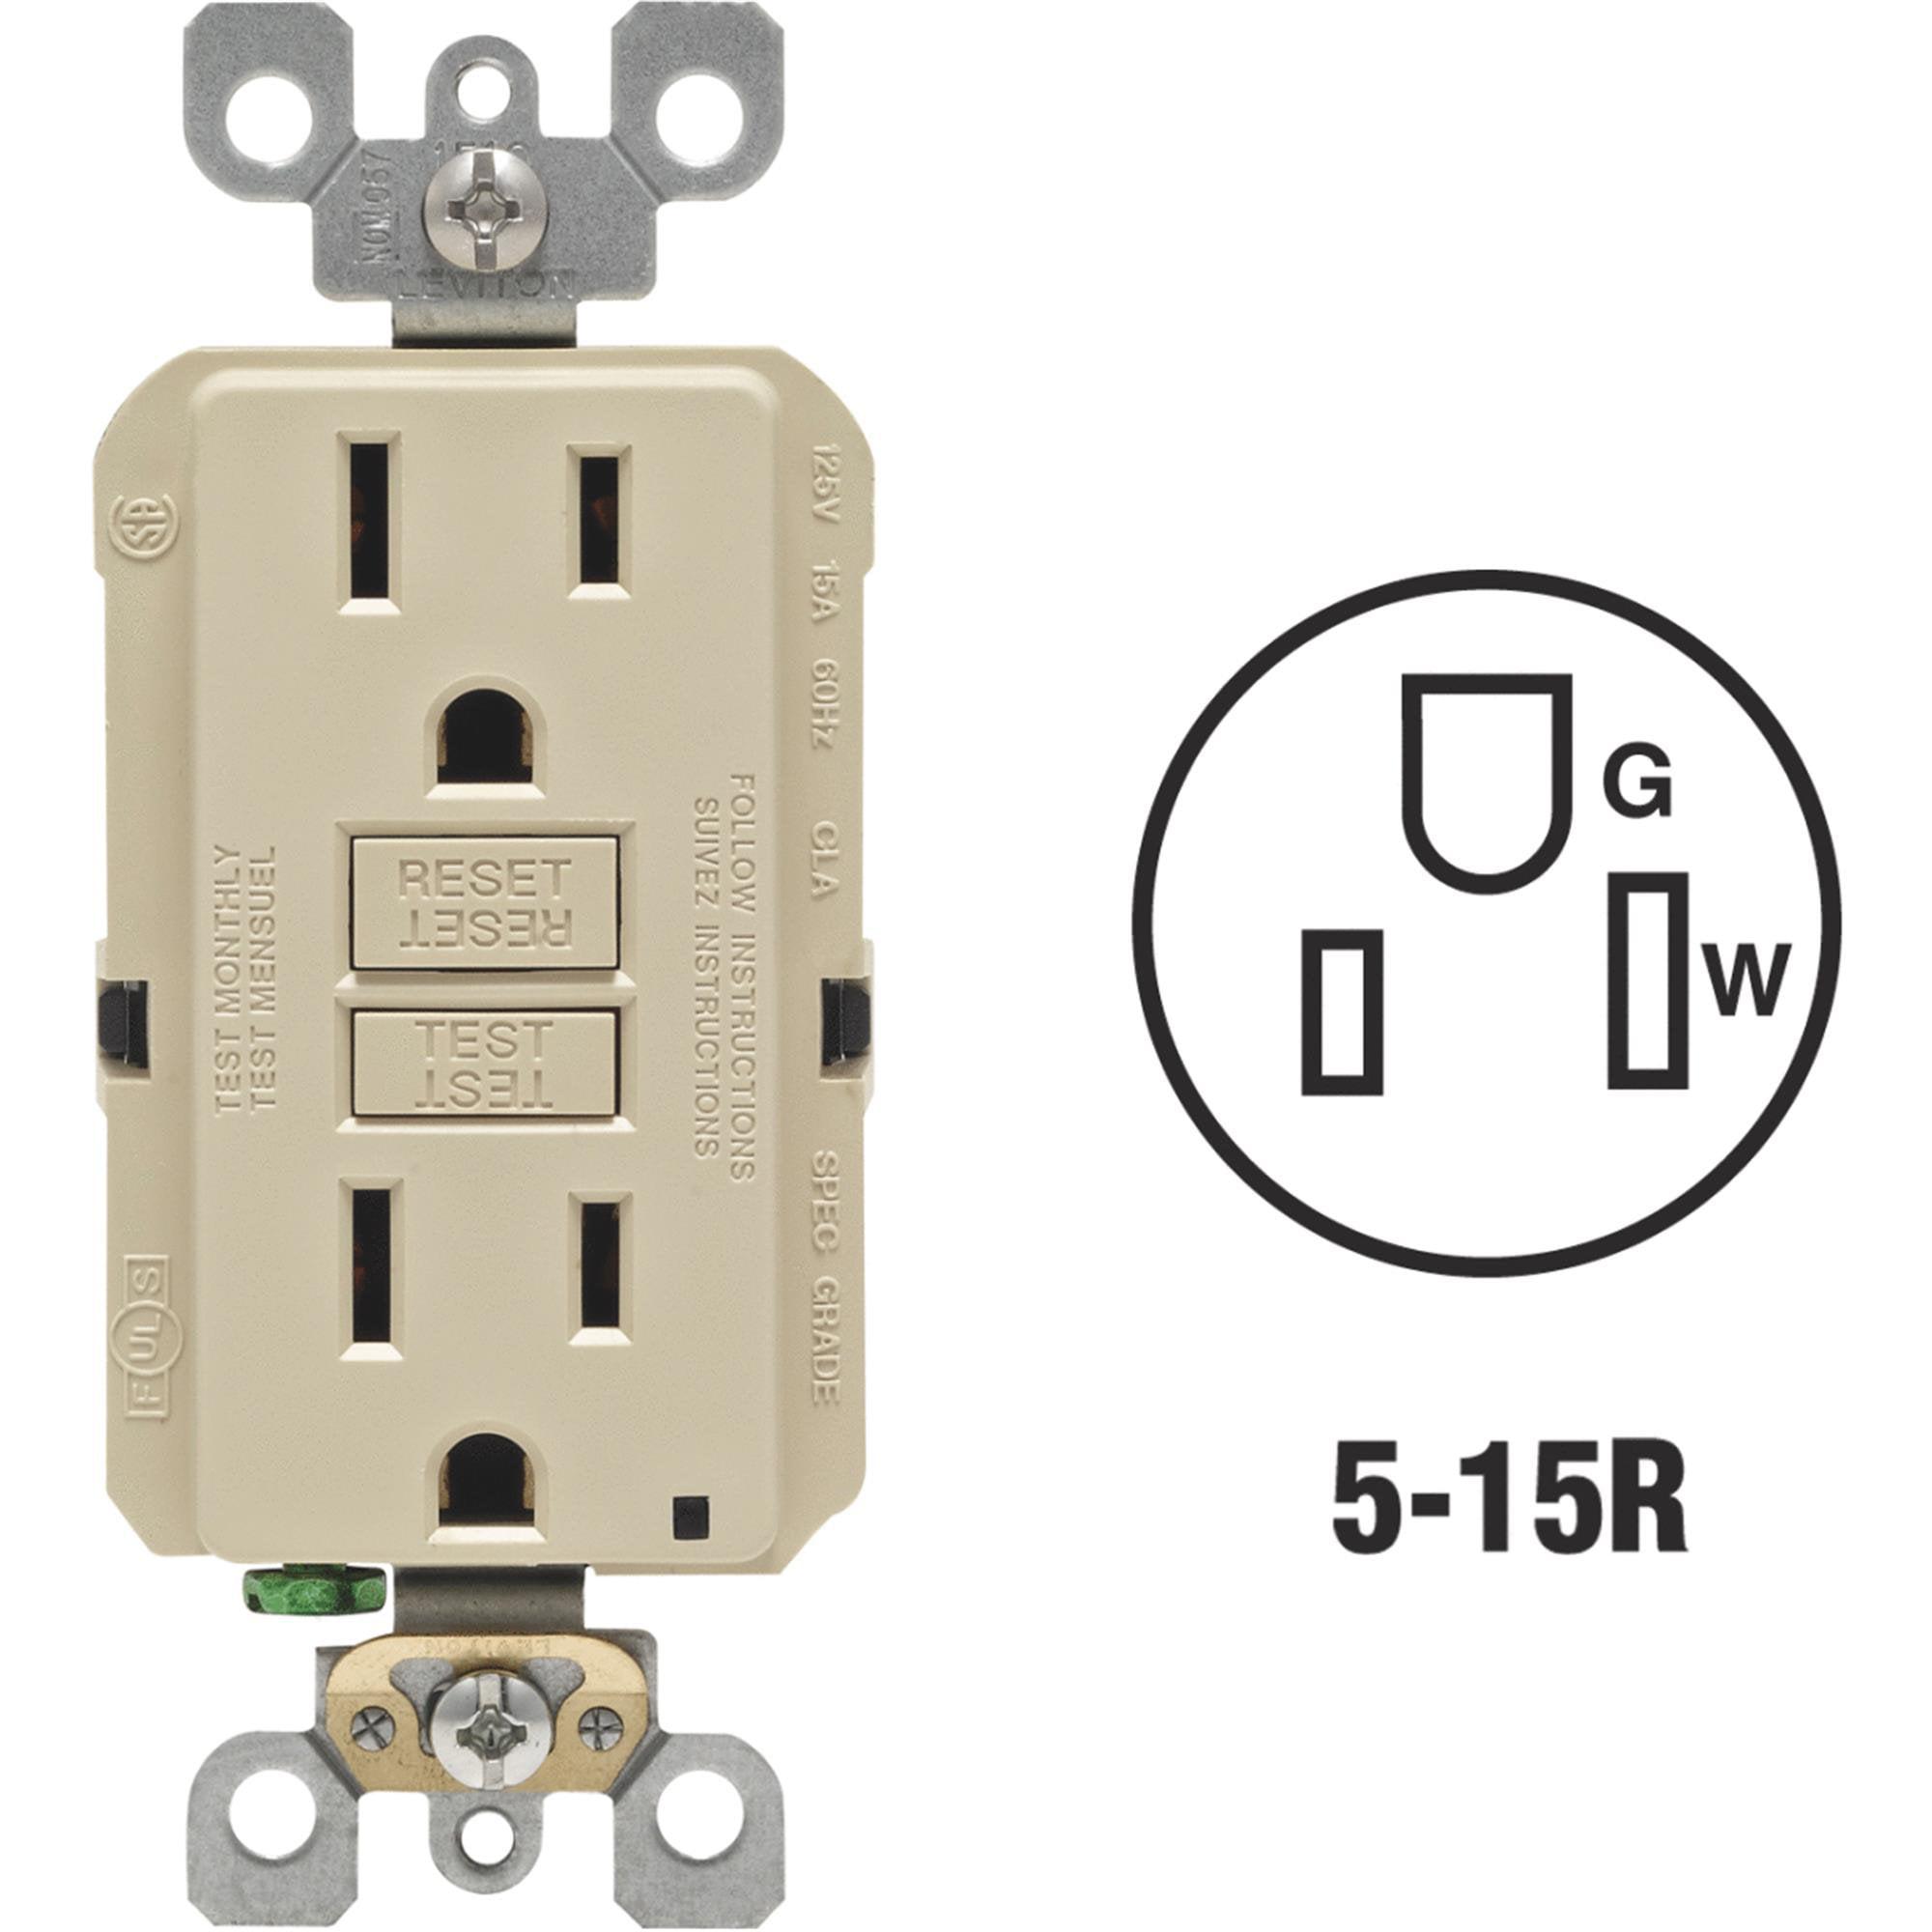 Leviton SmartLockPro Self-Test Rounded Corner GFCI Outlet